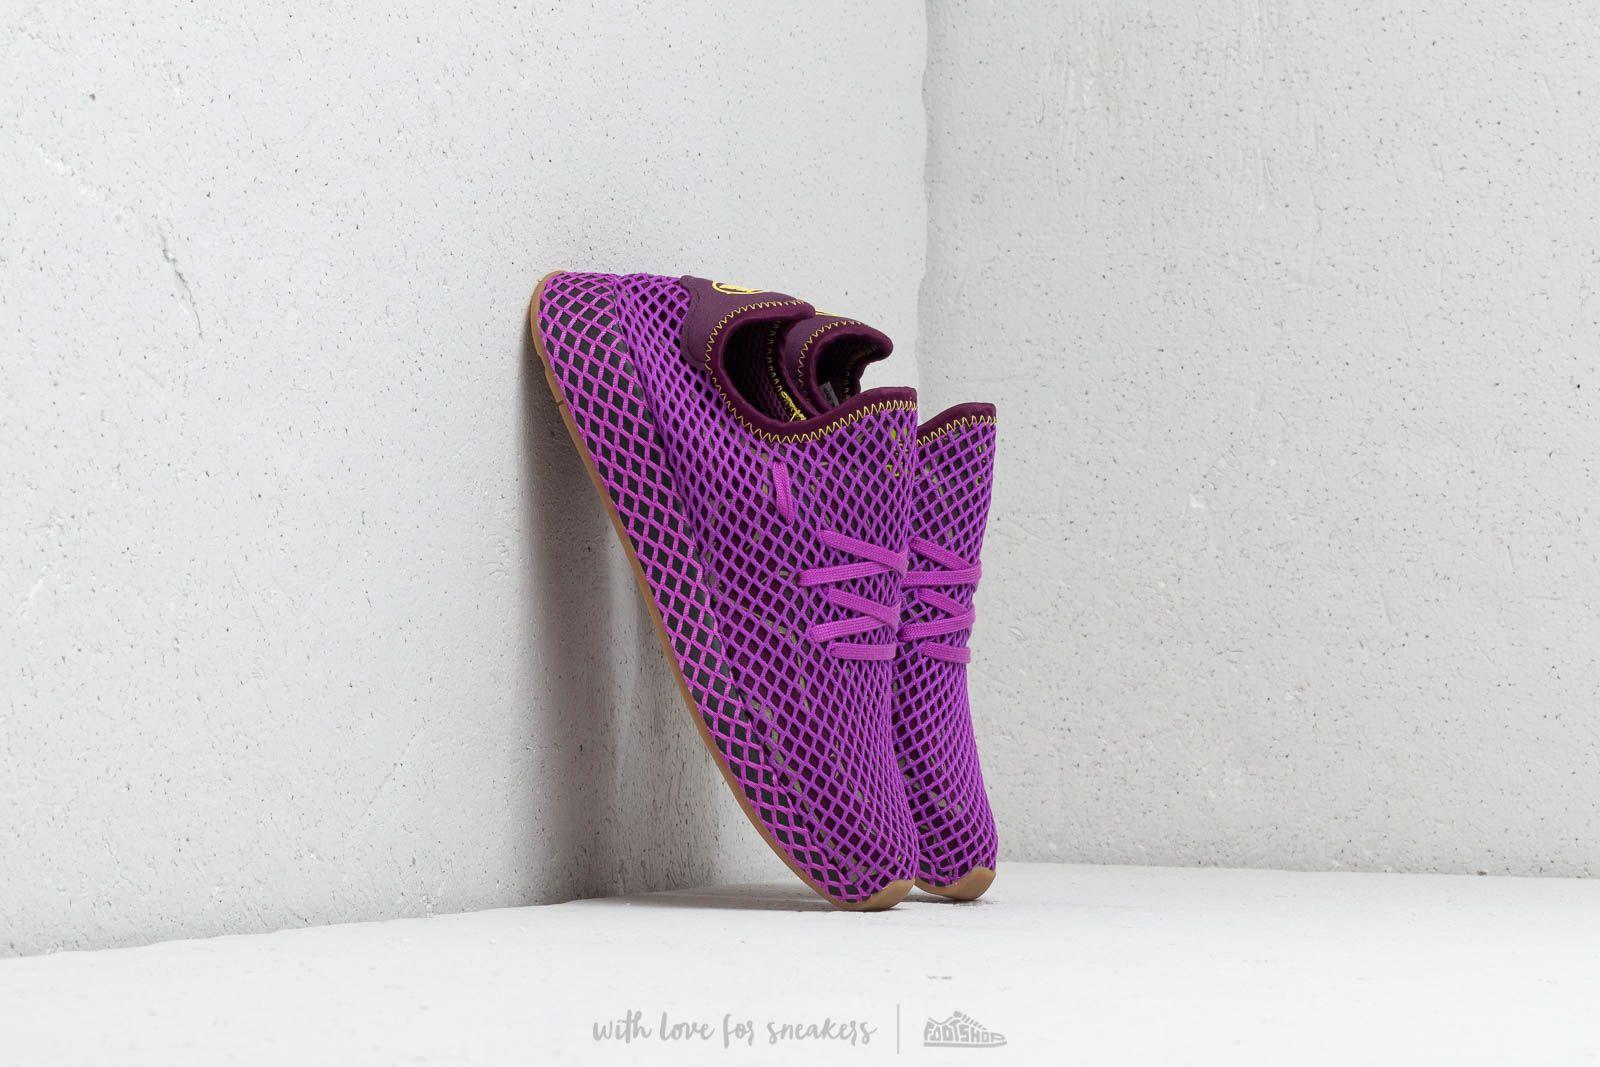 deerupt adidas purple